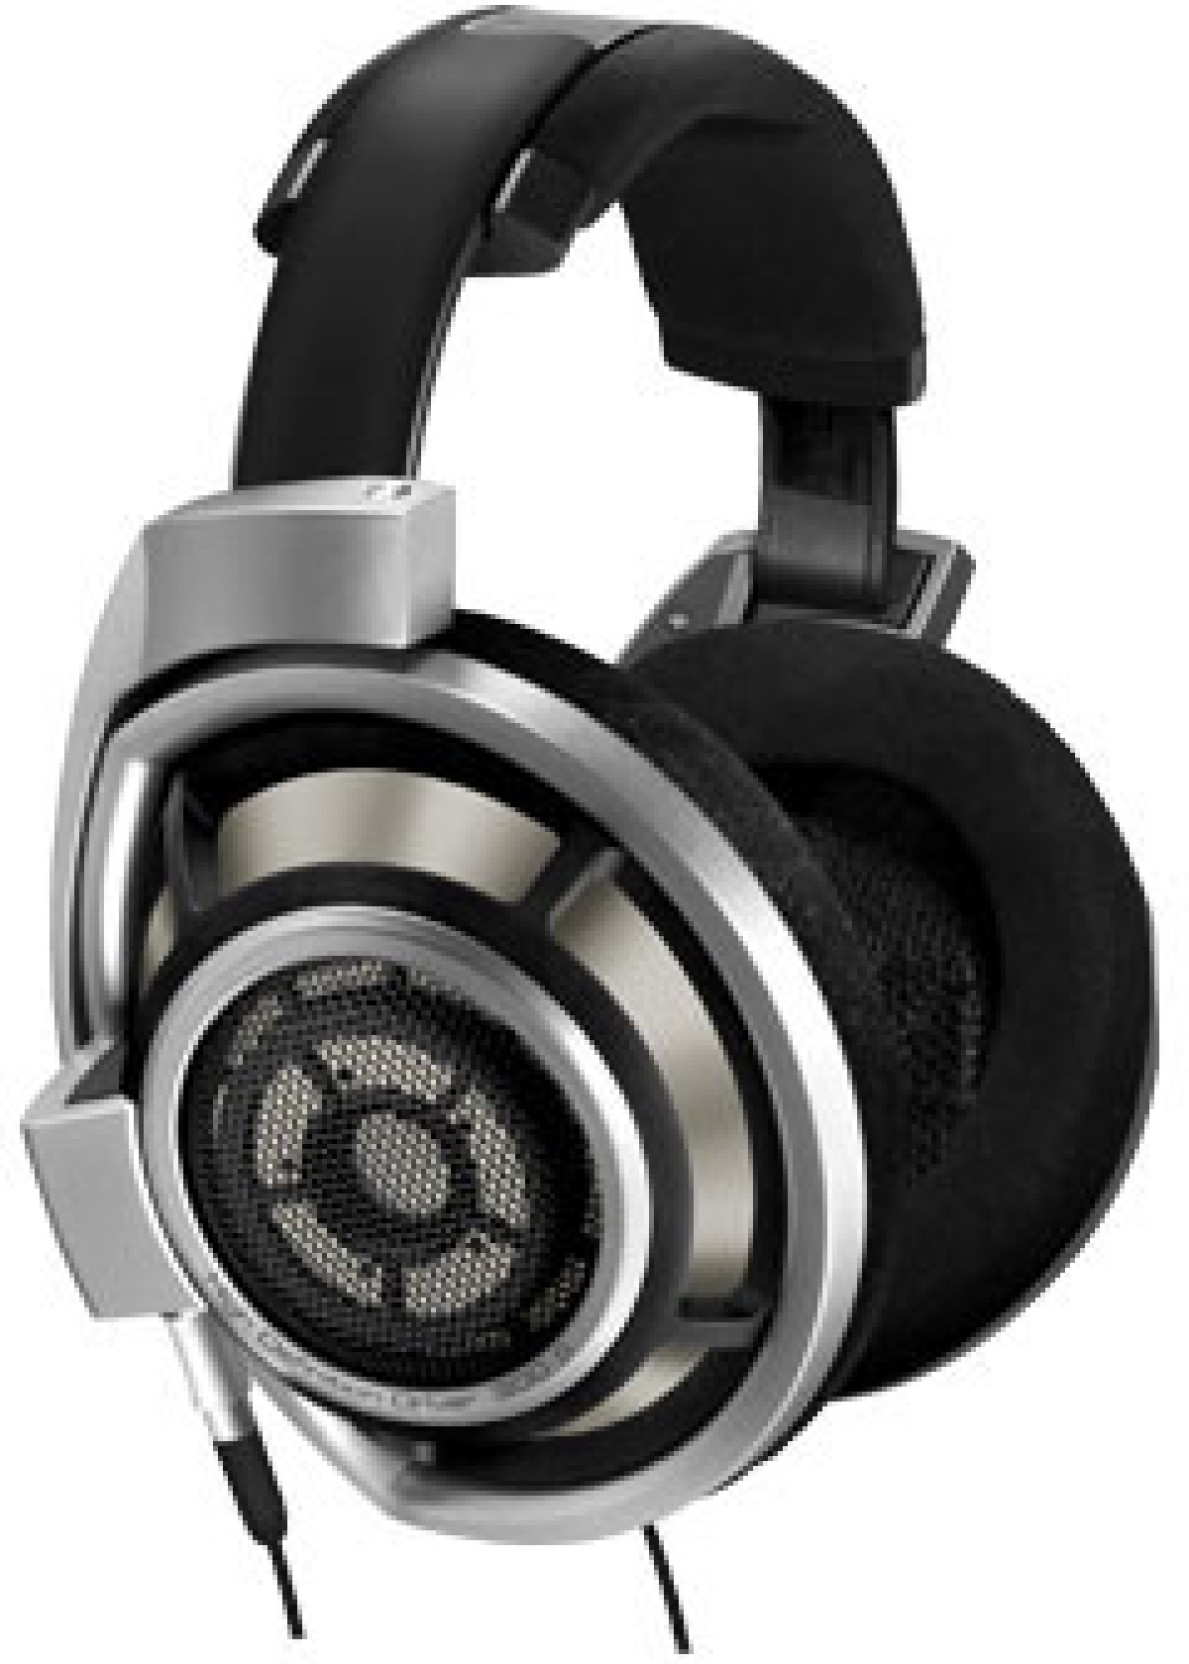 Sennheiser Hd 800 Wired Headphone Price In India Buy